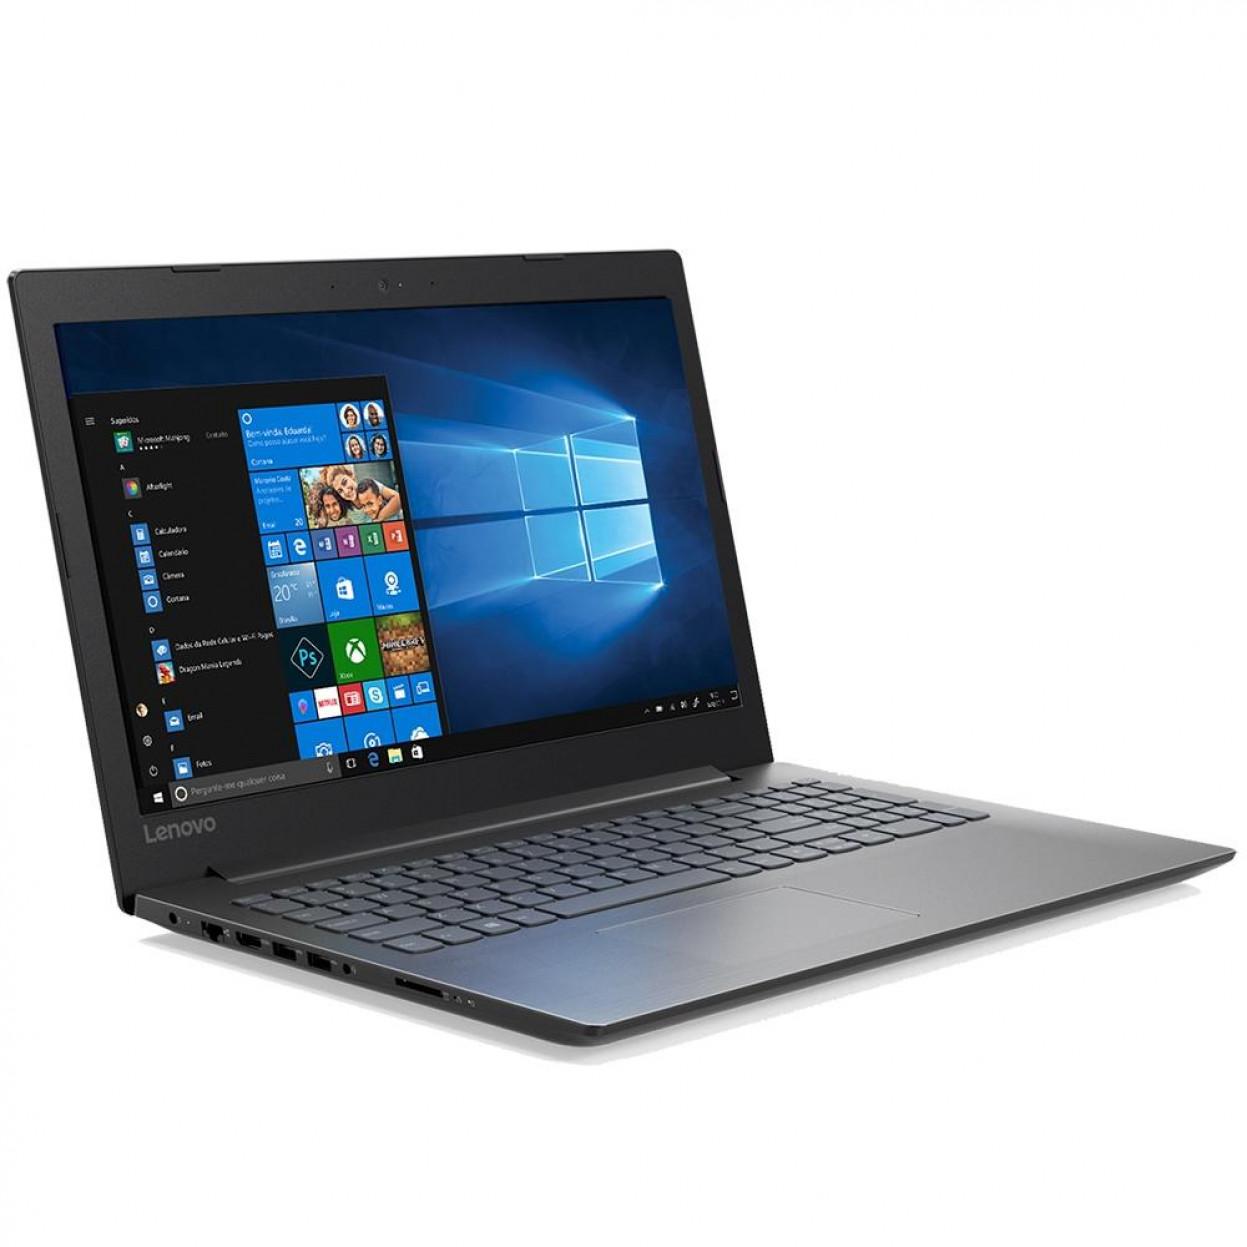 Notebook Lenovo B330 Core I5 8250u Memoria 4gb Ddr4 Hd 1tb Tela 15.6' Fhd Windows 10 Home